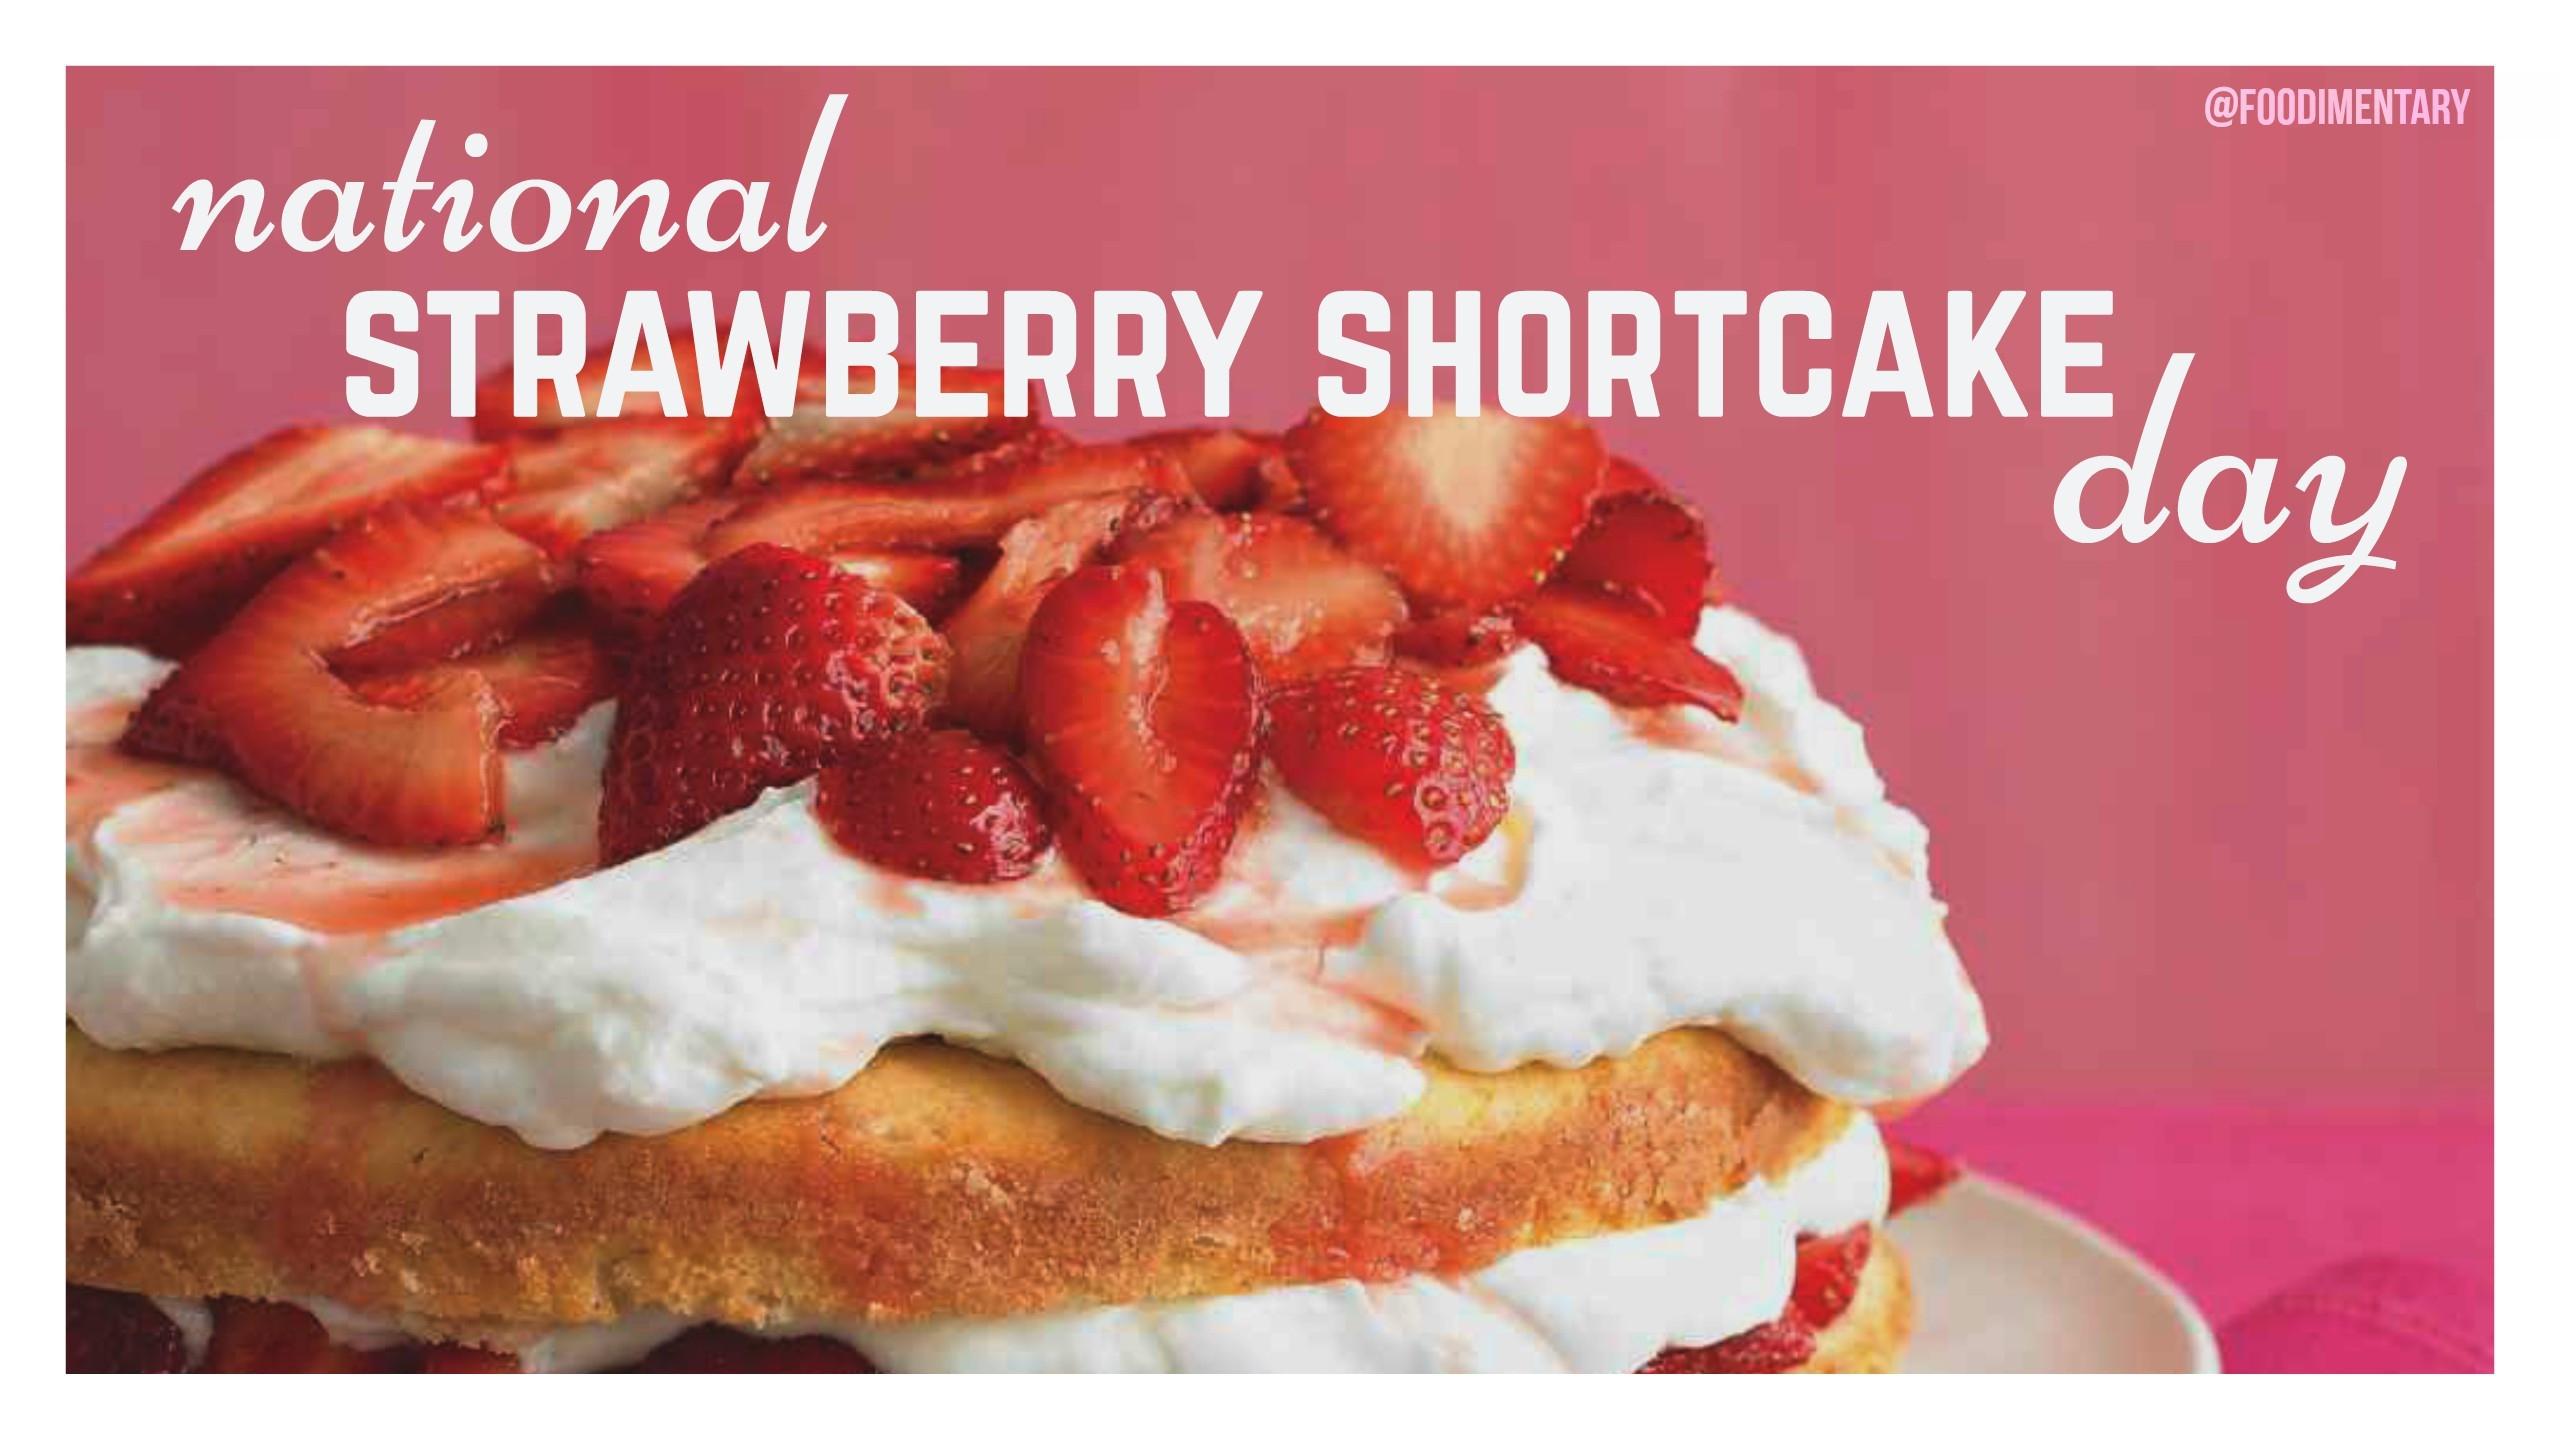 National Strawberry Shortcake Day 2019   Qualads-National Food Holidays For 2021